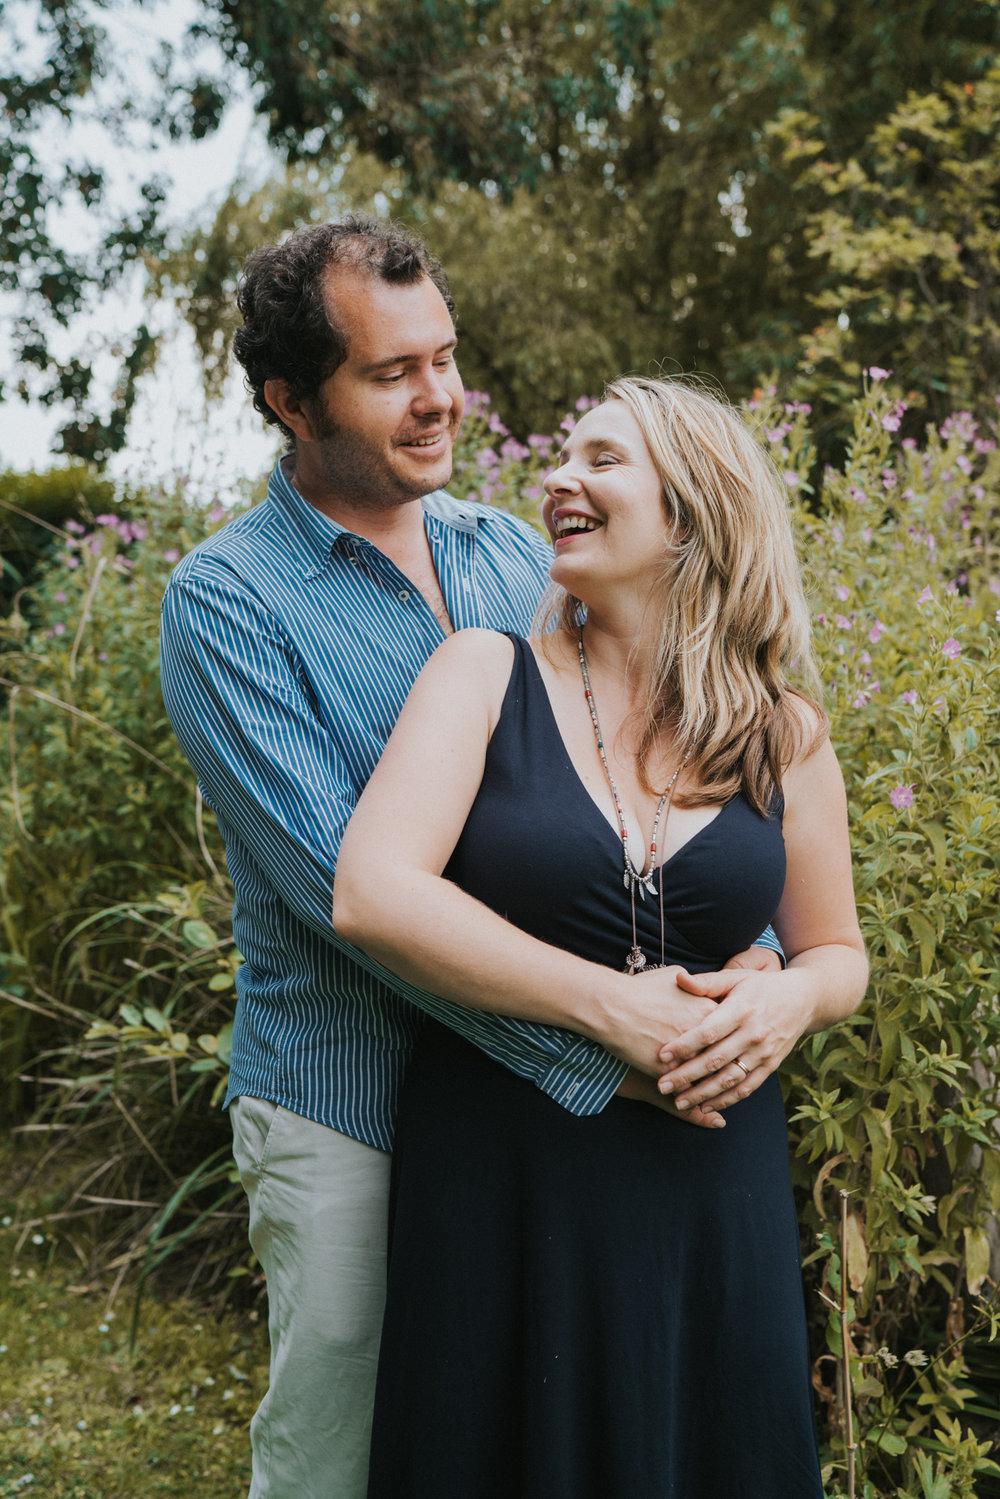 Parkers-Extended-Family-Session-Grace-Elizabeth-Alternative-Wedding-Lifestyle-Photographer-Colchester-Essex-Norfolk-Suffolk-Devon (36 of 62).jpg